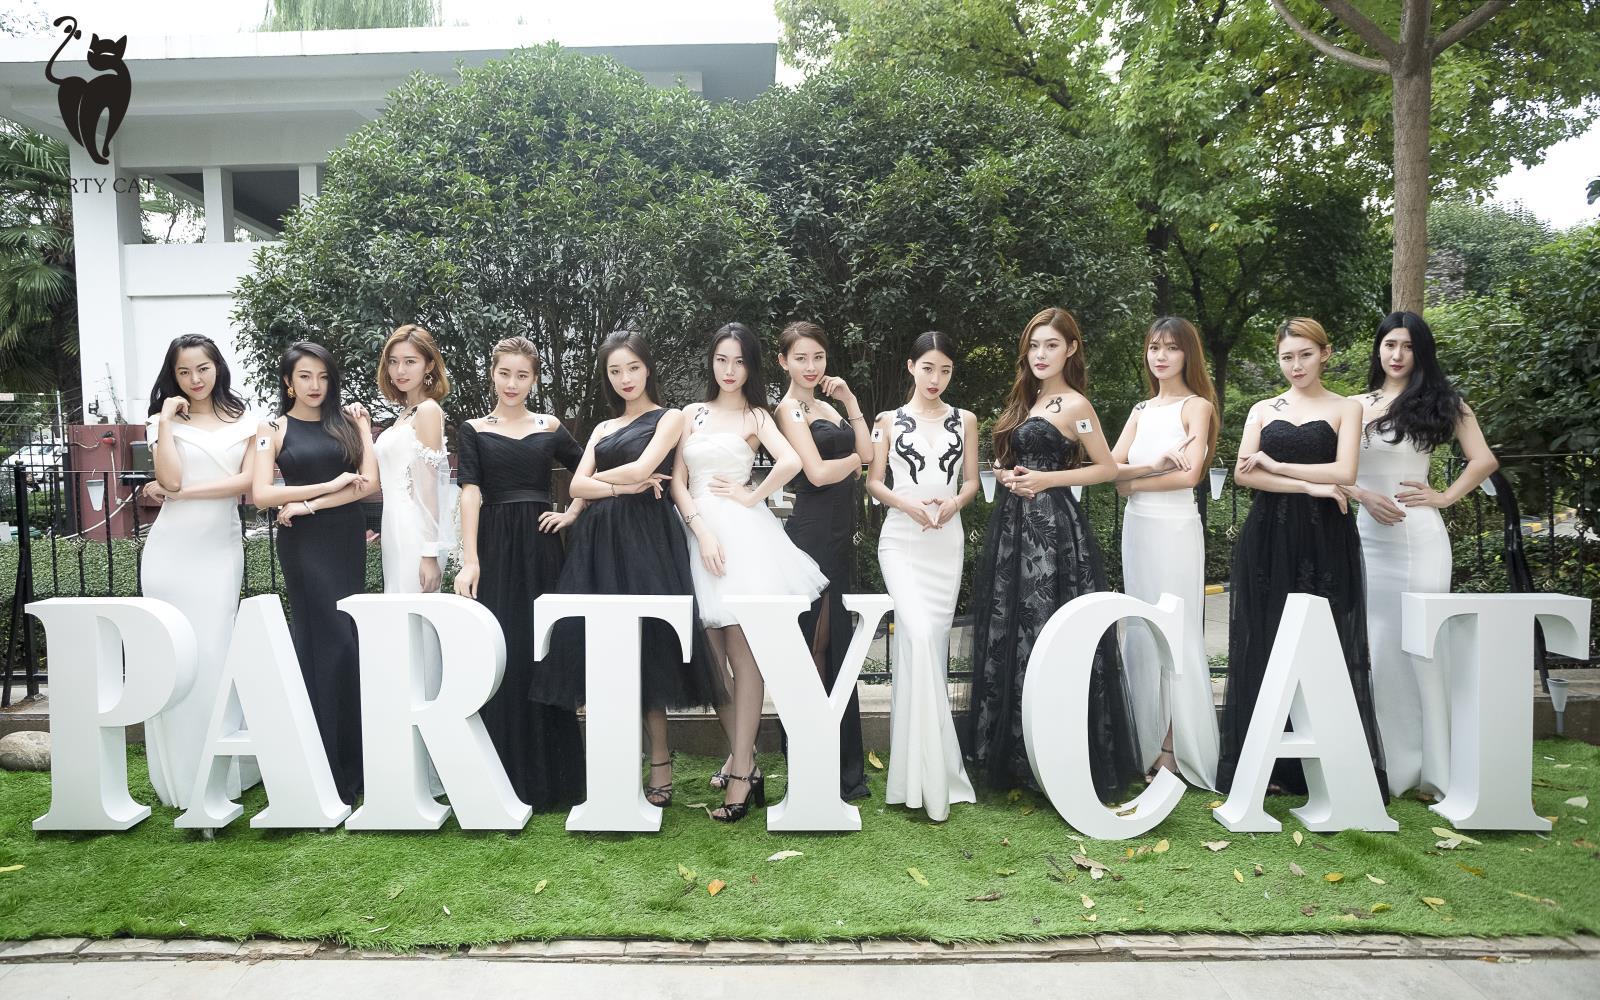 [PartyCat轰趴猫] Vol.001 楠_哥 写真